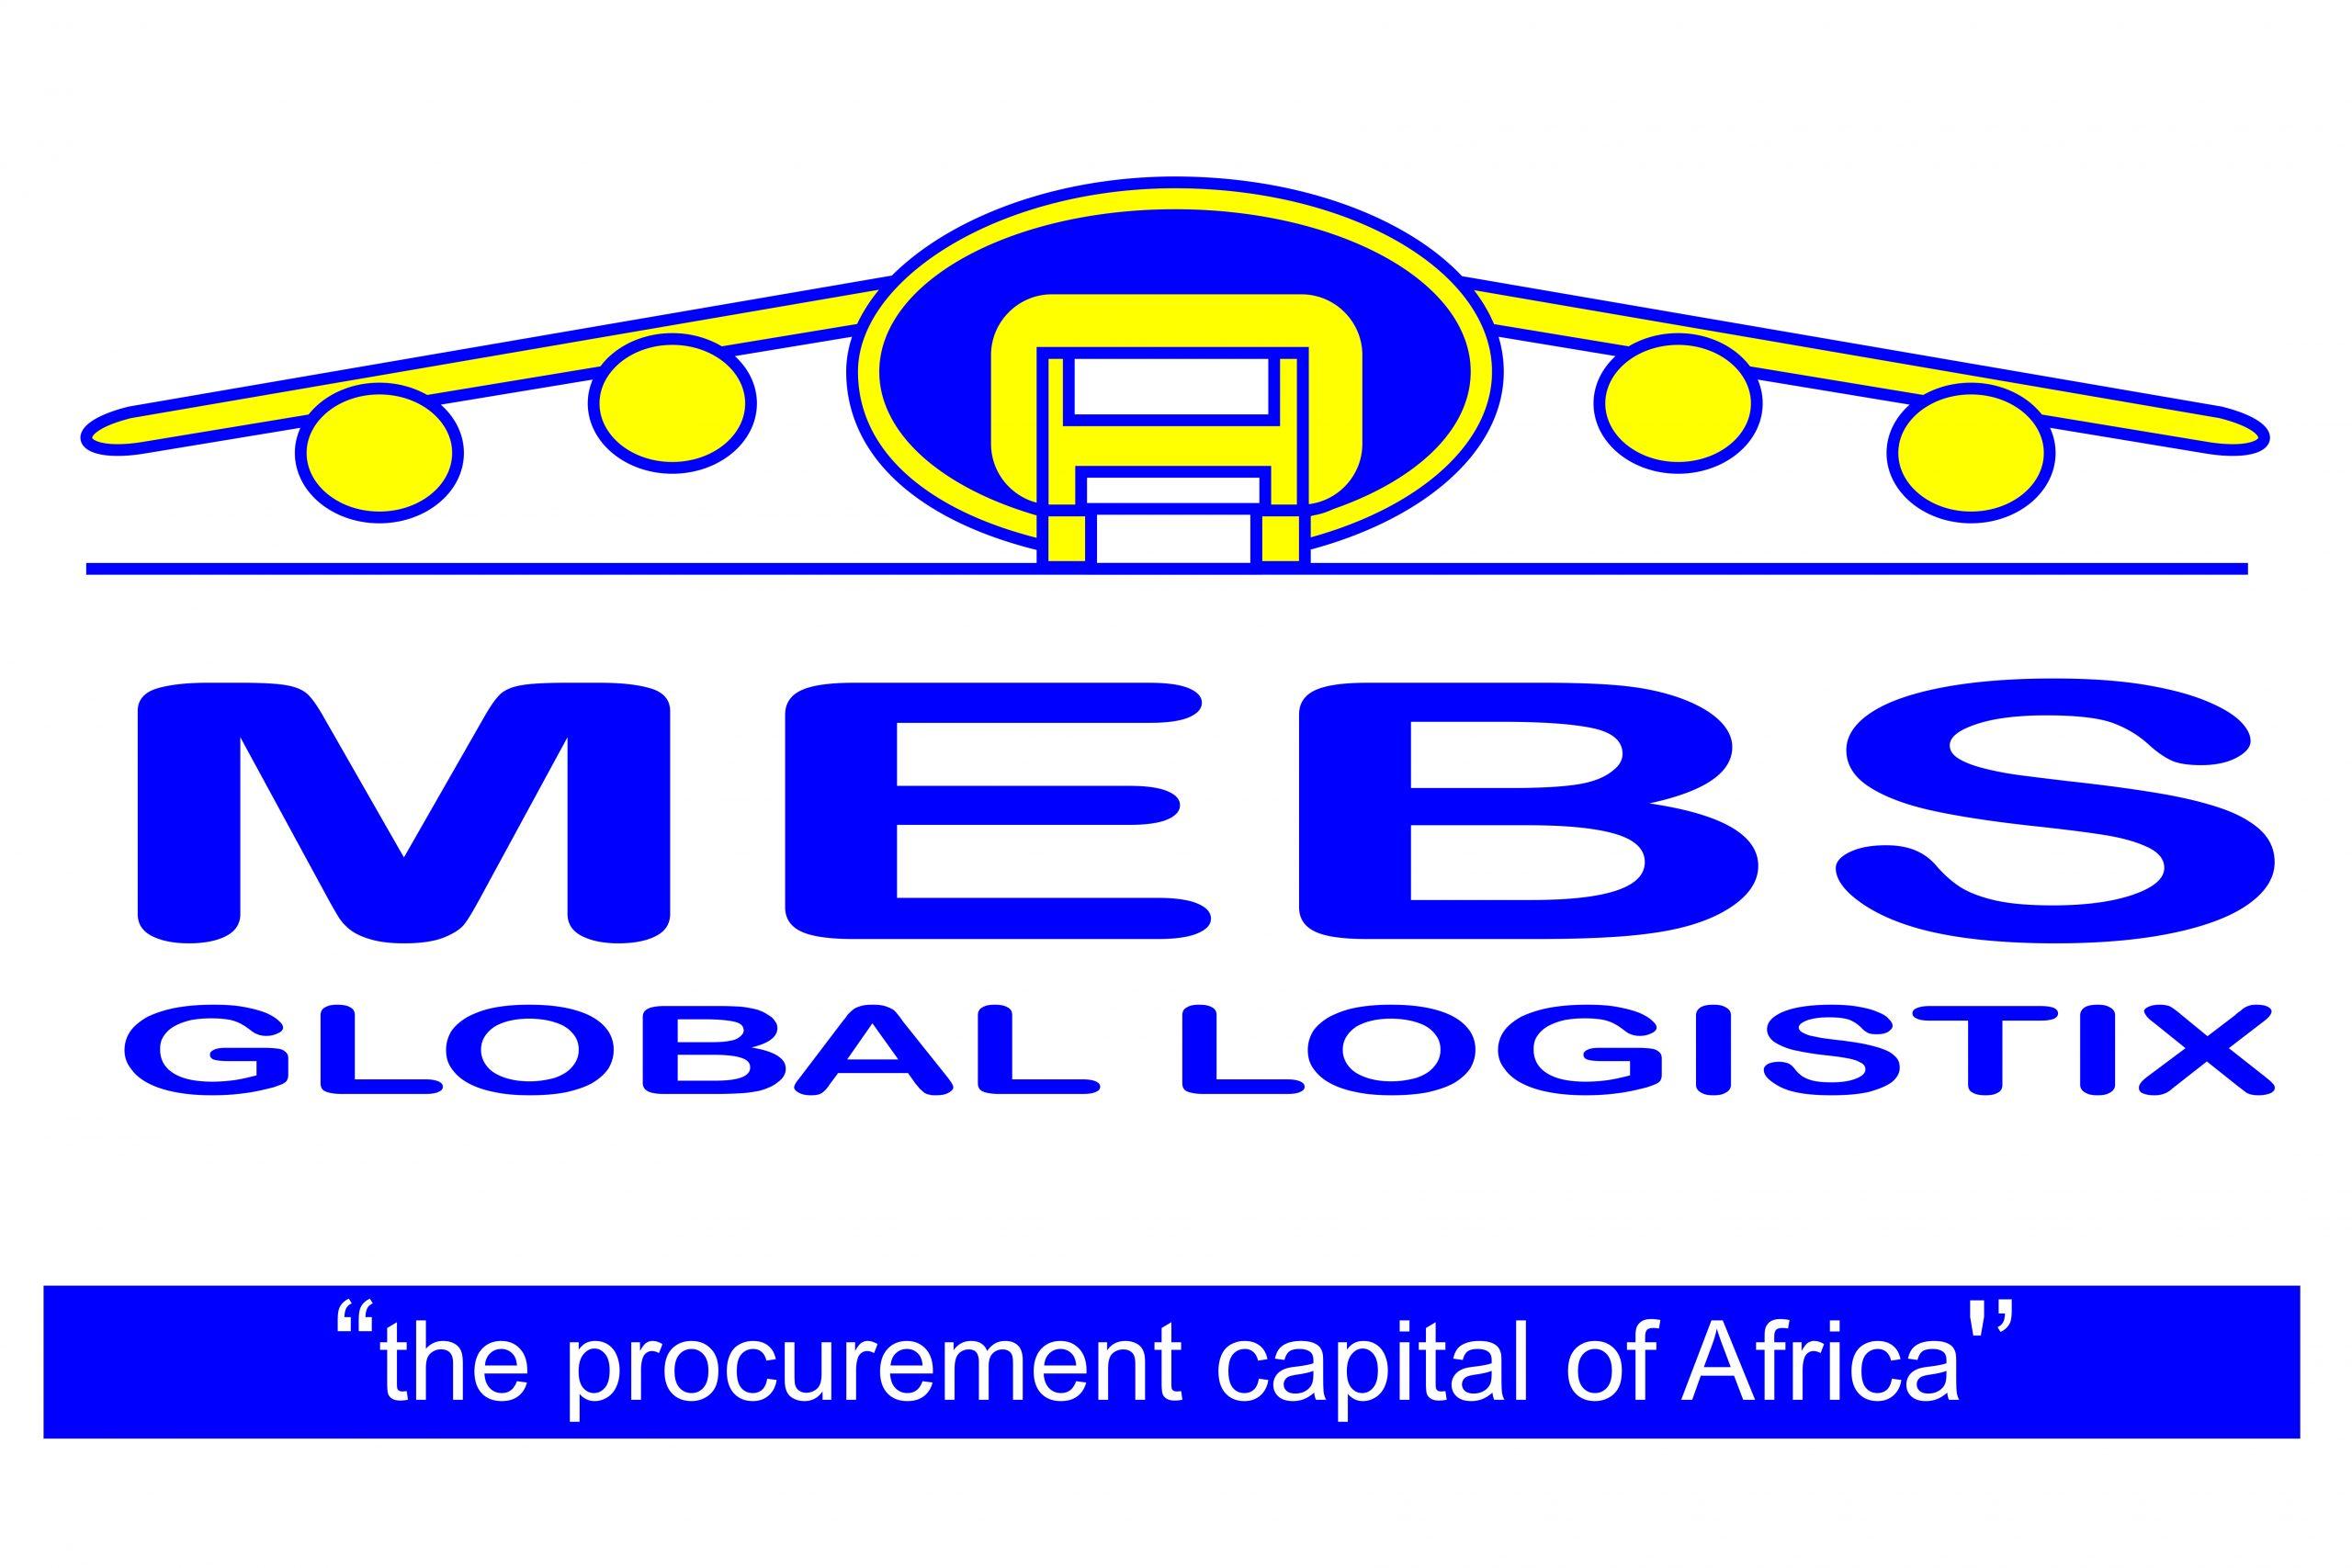 Mebs Global Logistix